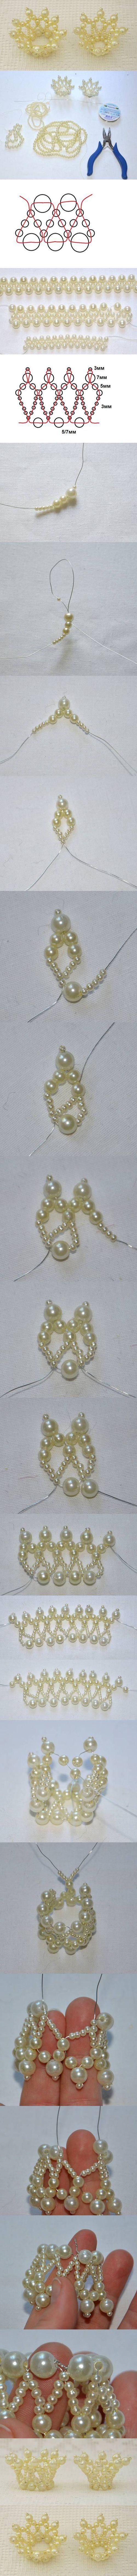 DIY Beads Doll Crown DIY Projects / UsefulDIY.com on imgfave